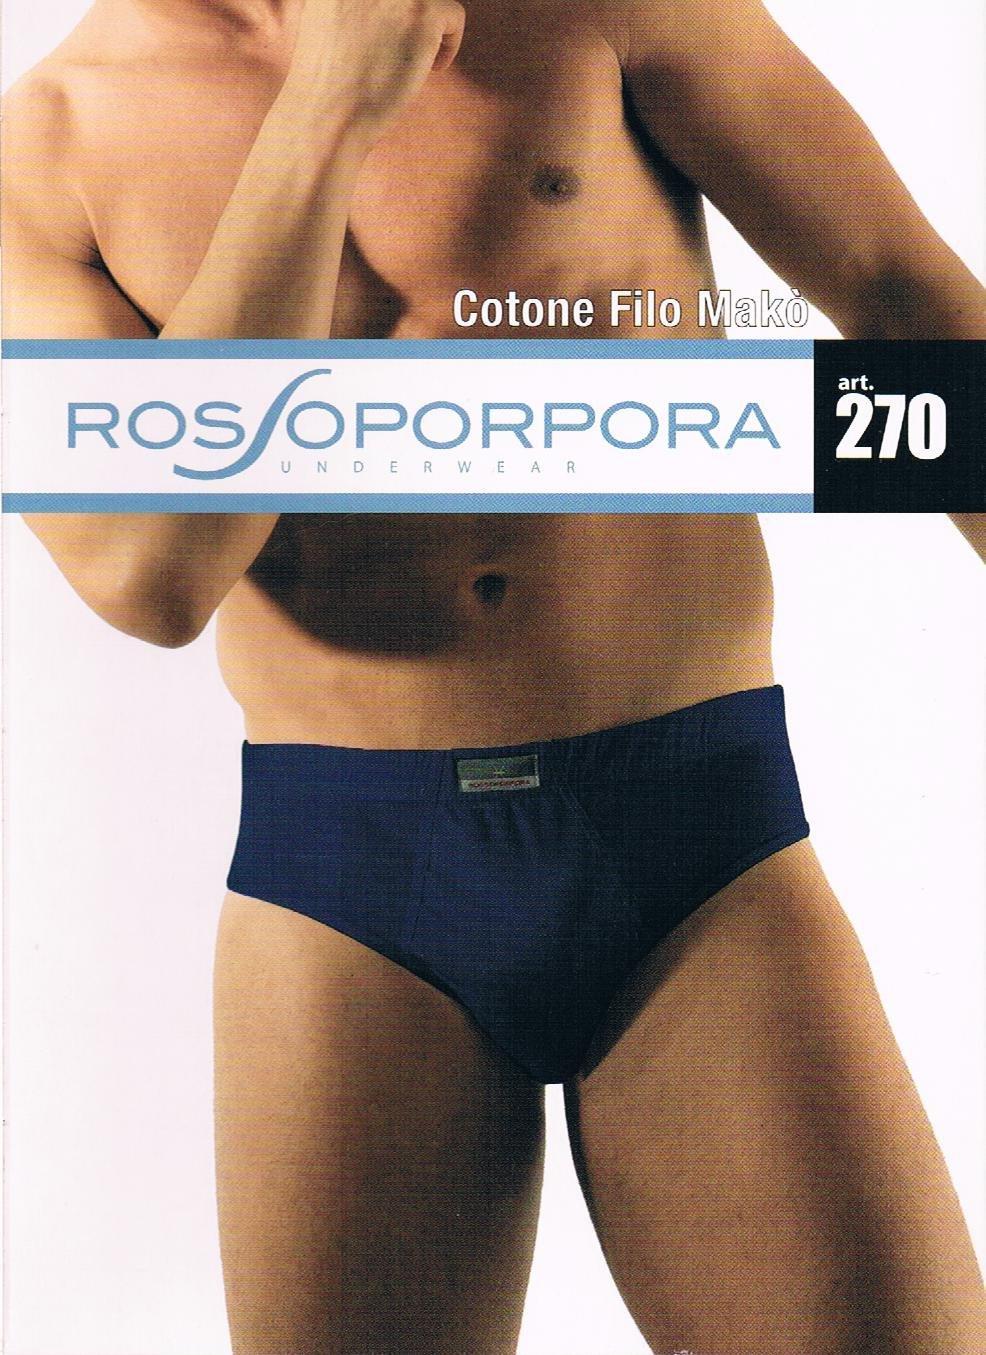 6 Slip Rossoporpora cotone filo Mak/ò 5 Taglia Scuri